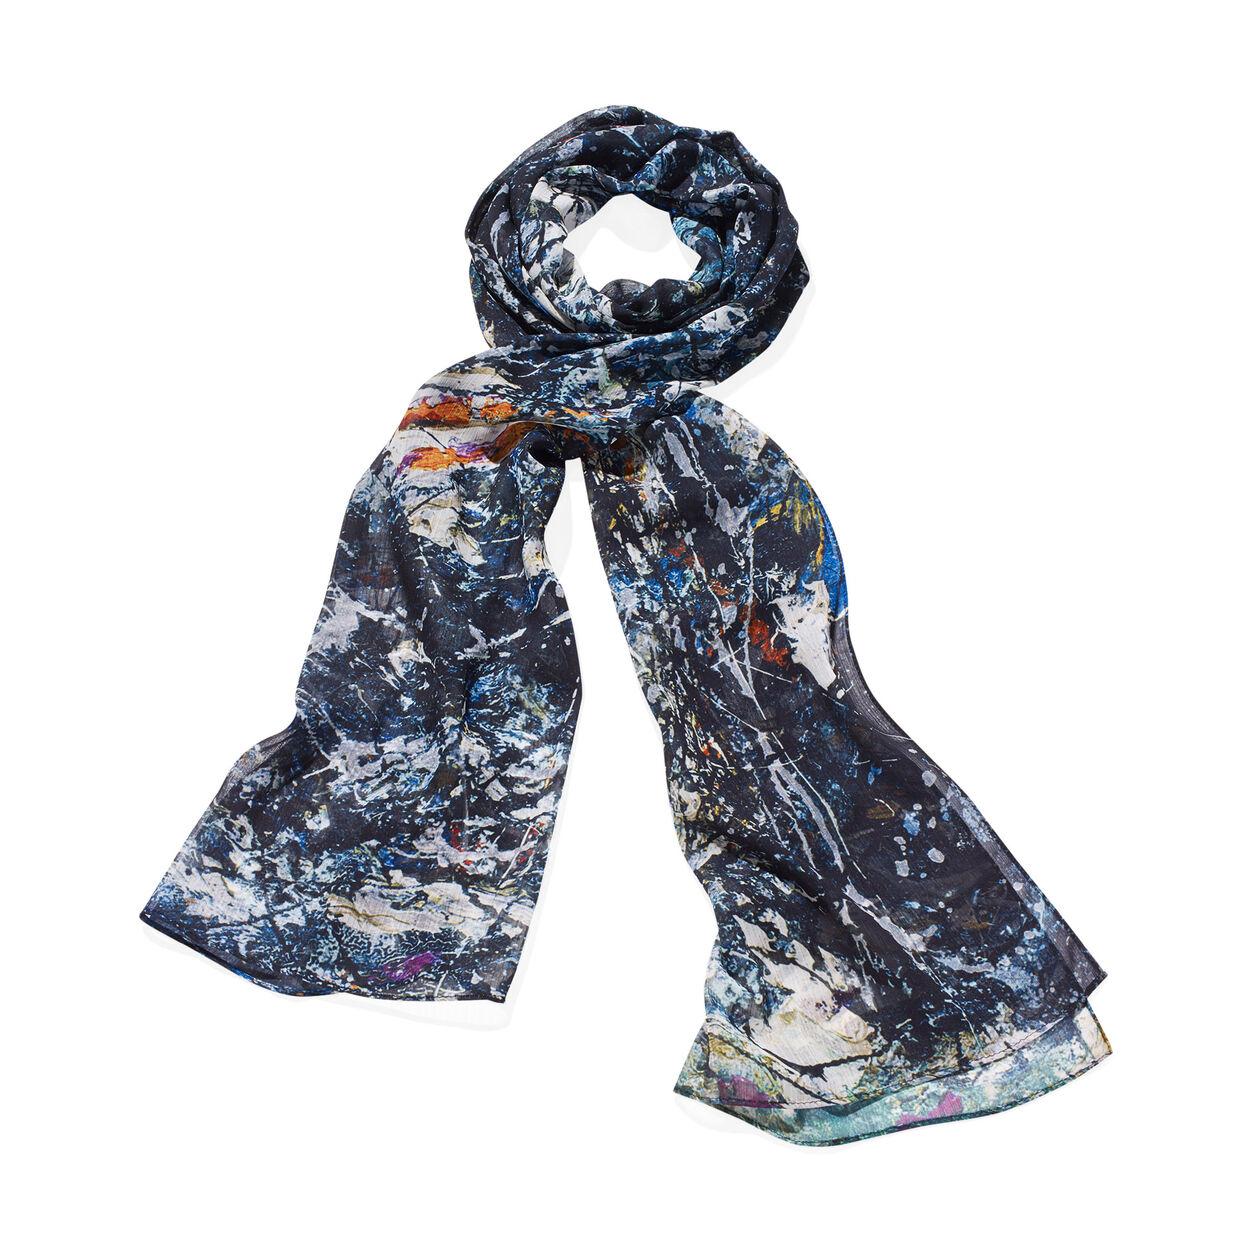 Jackson Pollock scarf